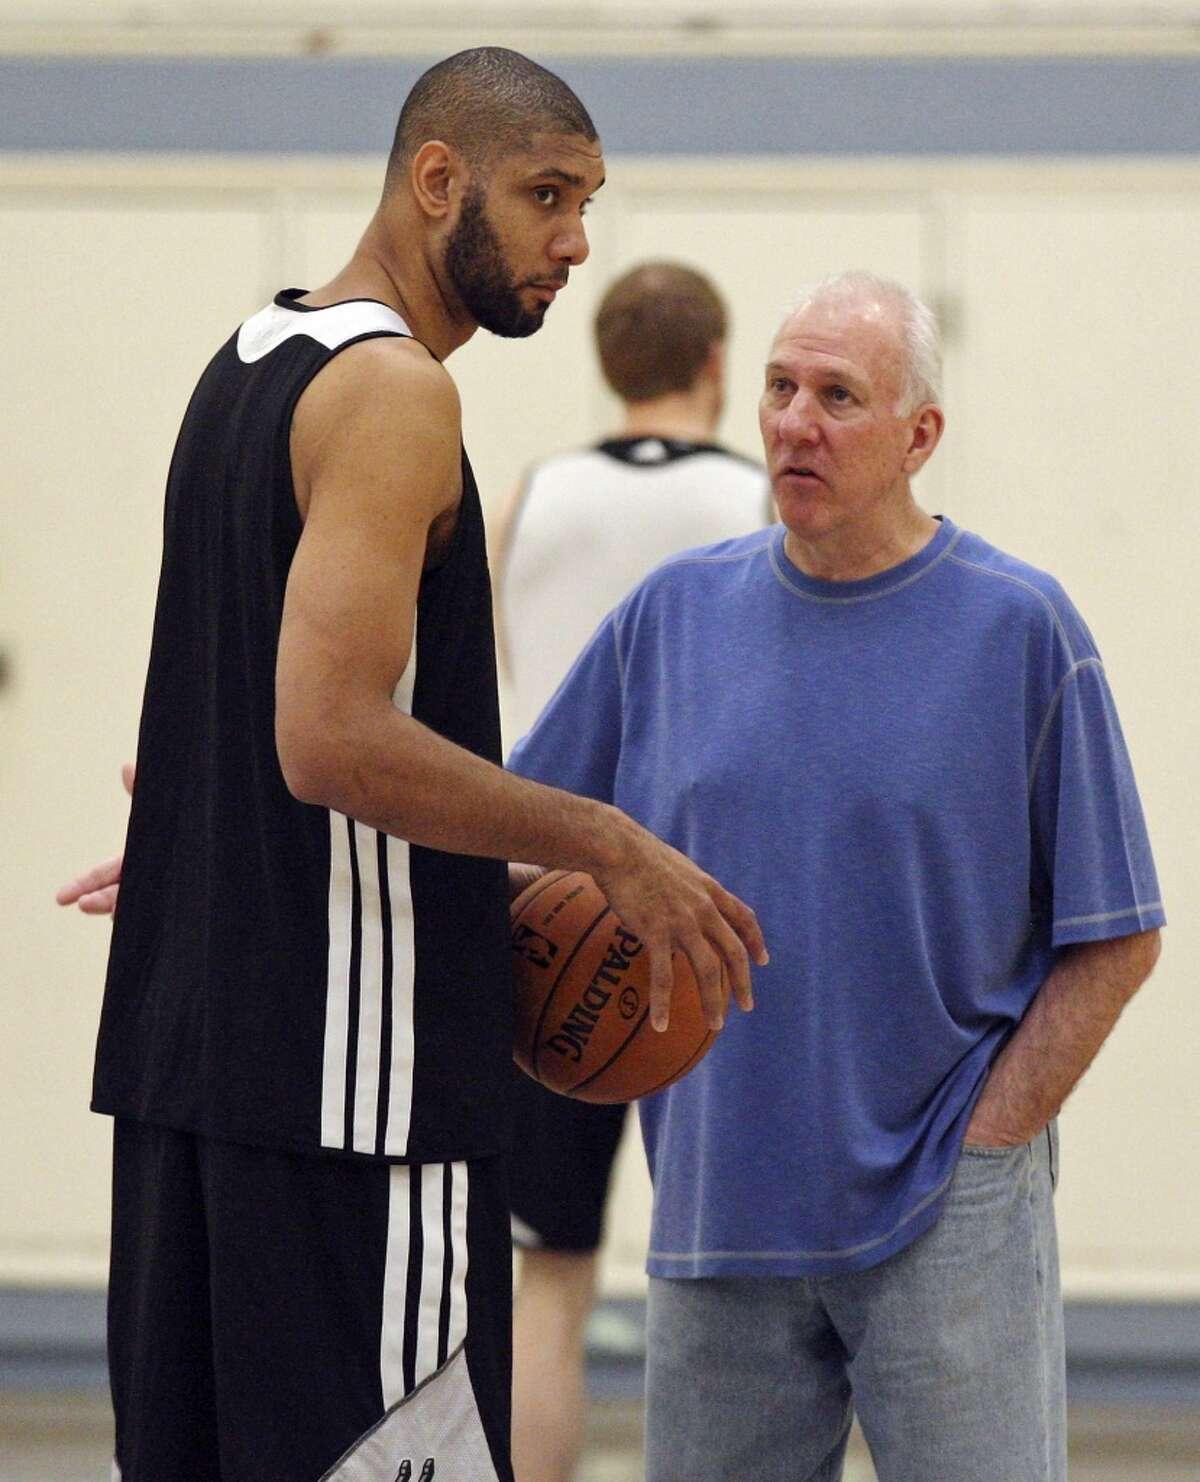 San Antonio Spurs' Tim Duncan talks with San Antonio Spurs head coach Gregg Popovich during practice Saturday April 27, 2013 at Santa Monica College in Santa Monica, CA.